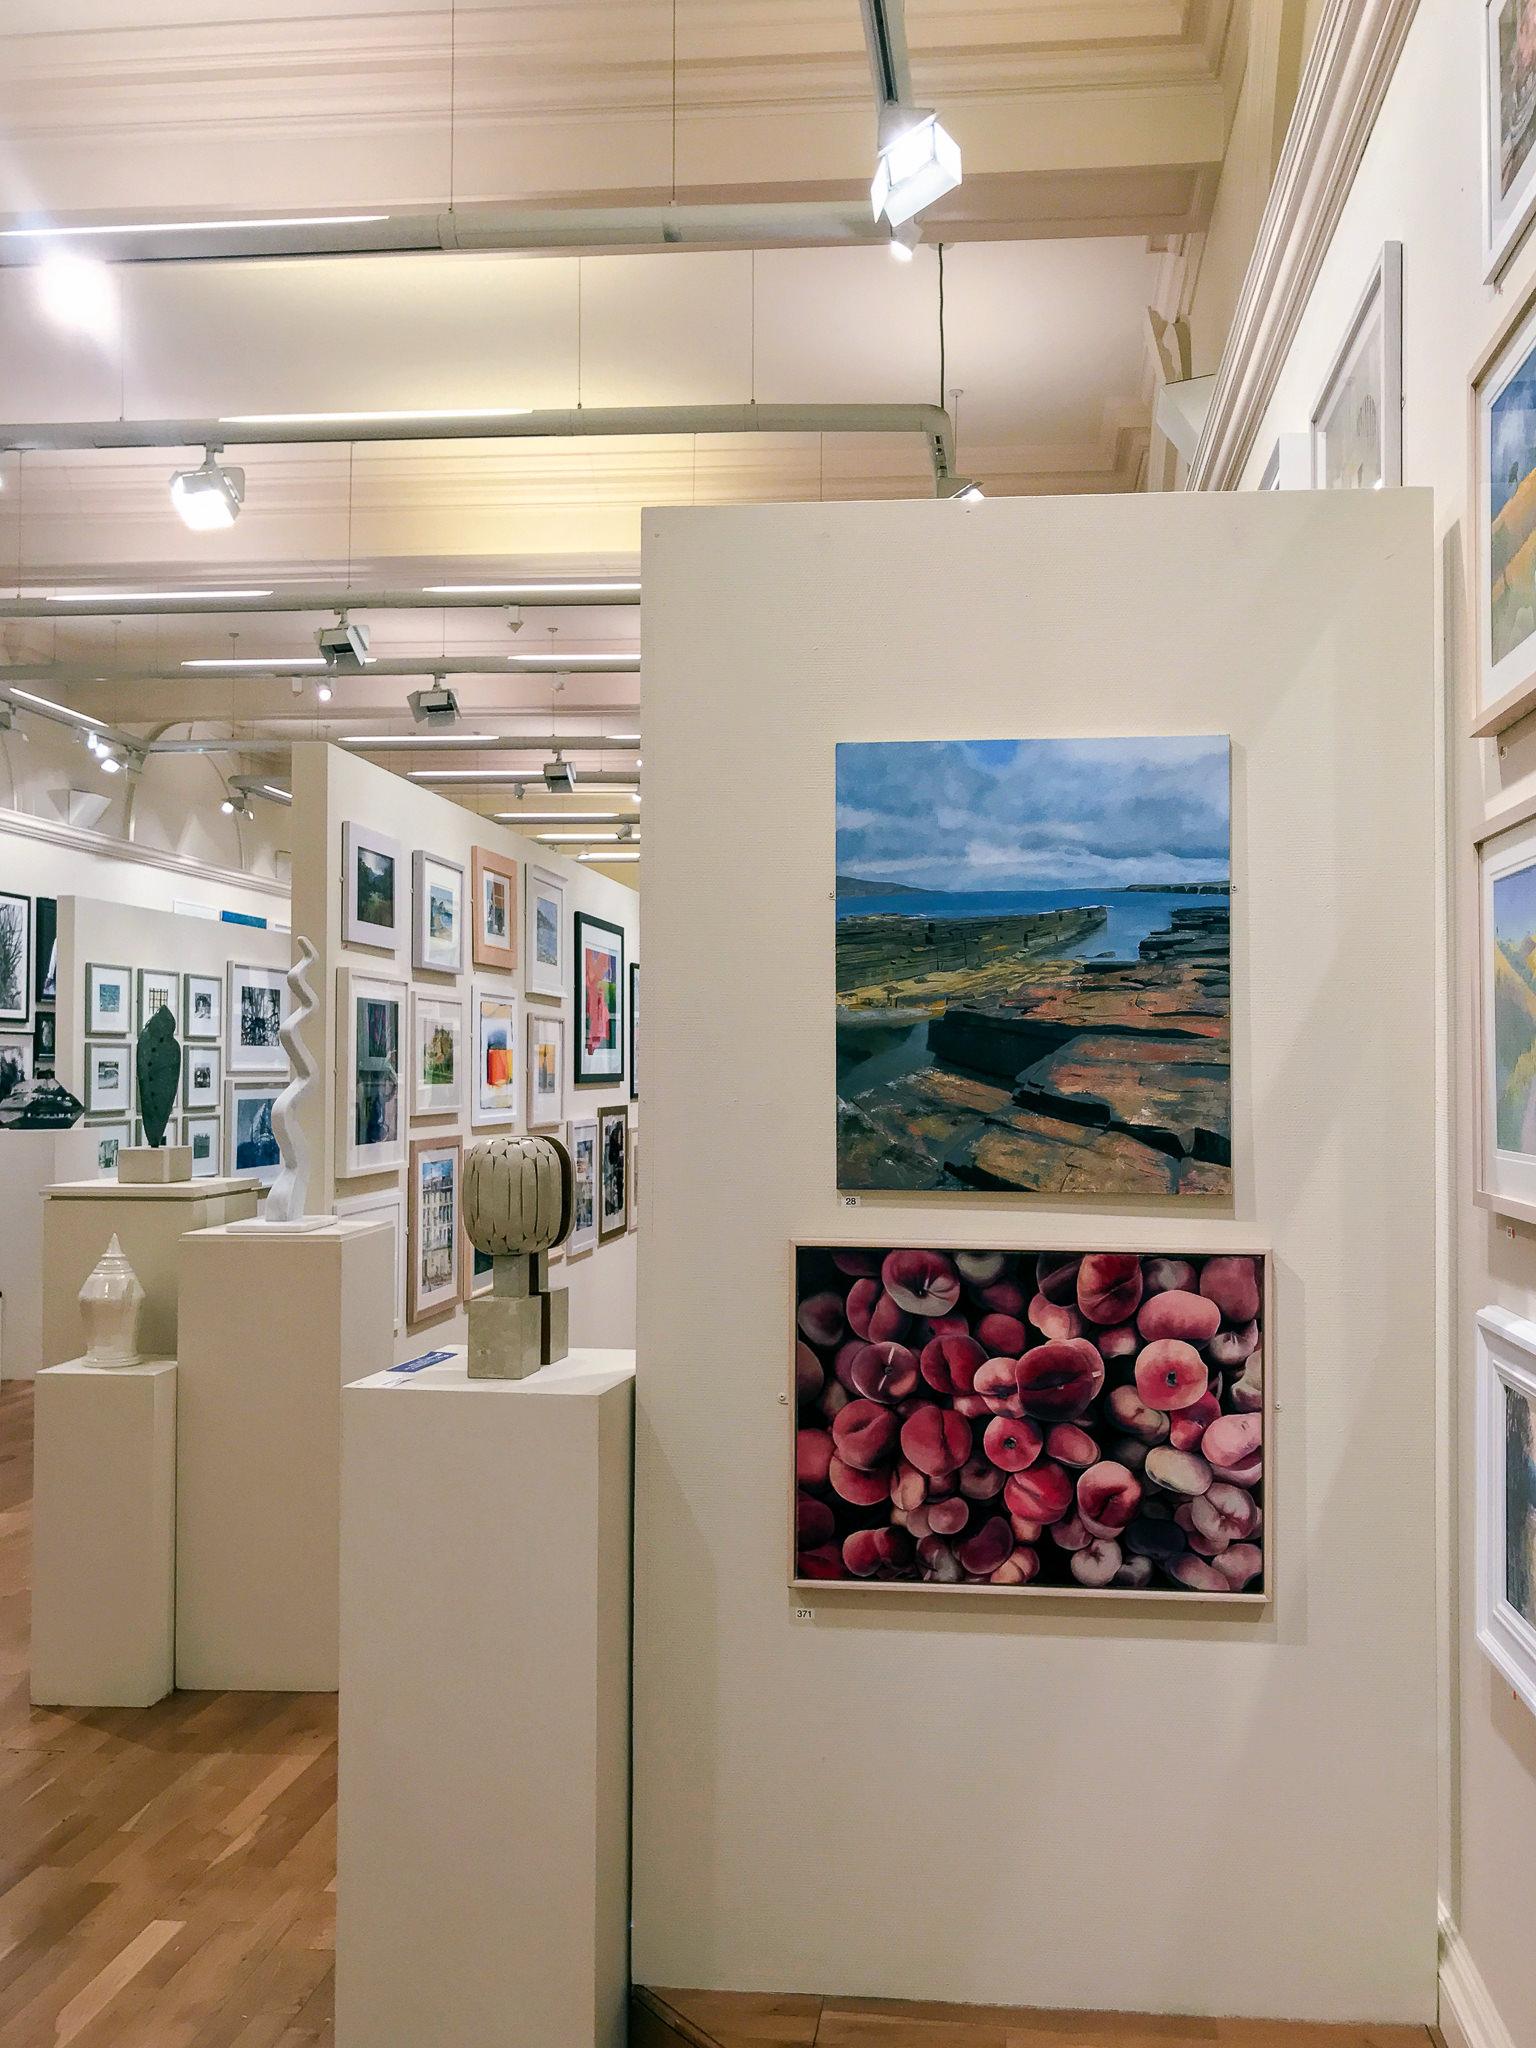 2 Days in Bath, England — Victoria Art Gallery-1.jpg